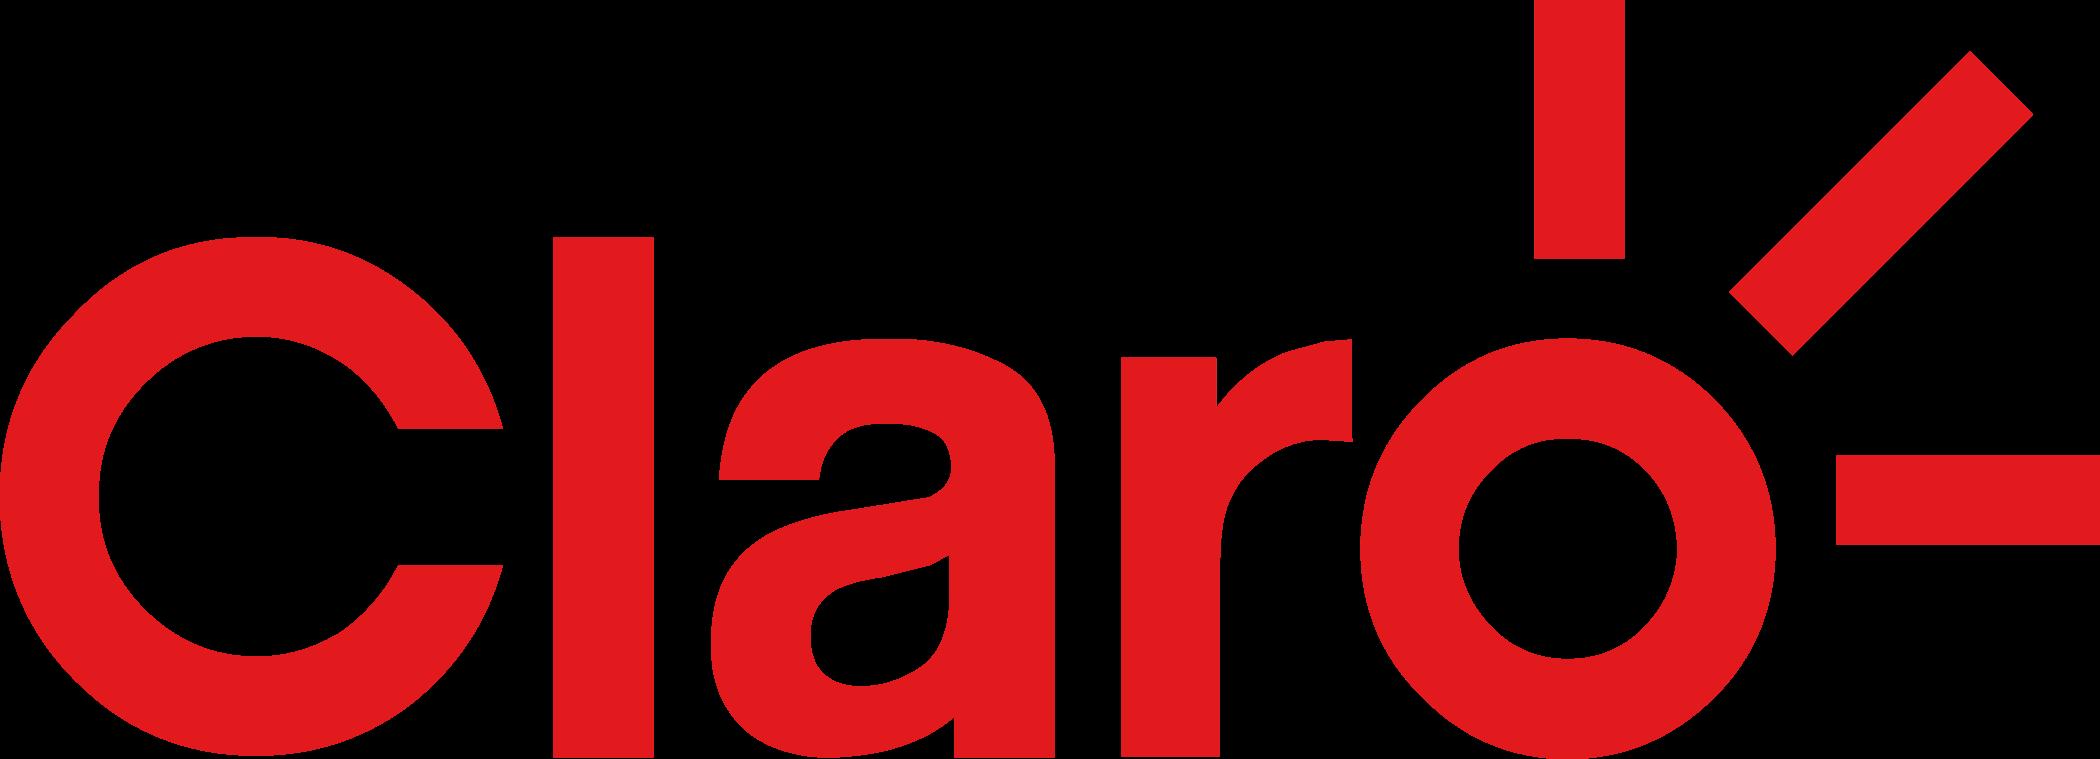 claro-hdtv-logo-3